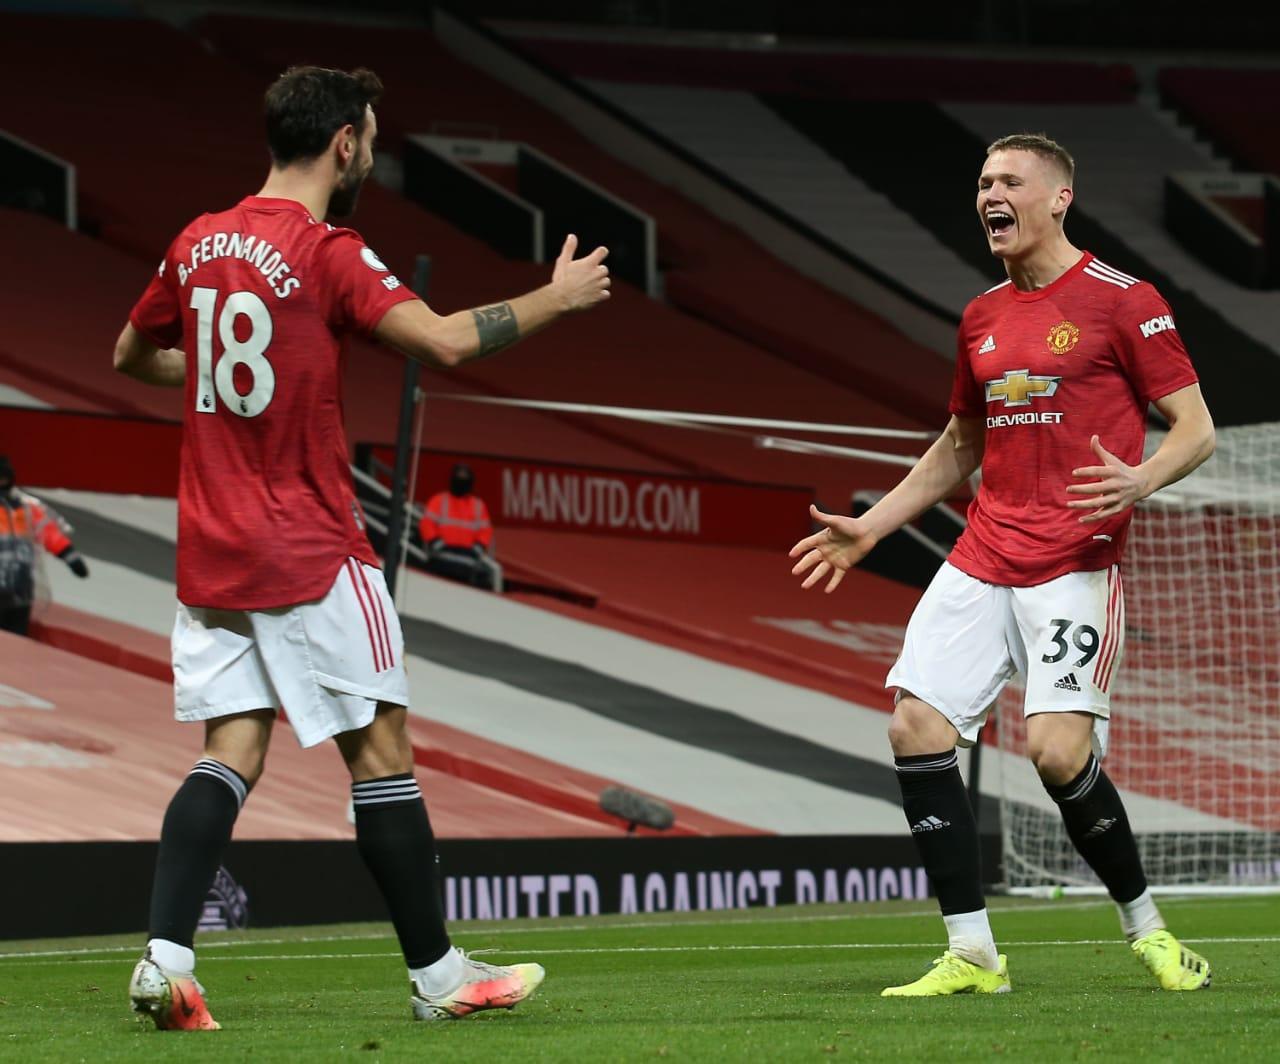 Scott McTominay dan Bruno Fernandes merayakan gol bunuh diri untuk MU yang diawali dari tendangan sudut. (Foto: Twitter/@ManUtd) man united vs west ham